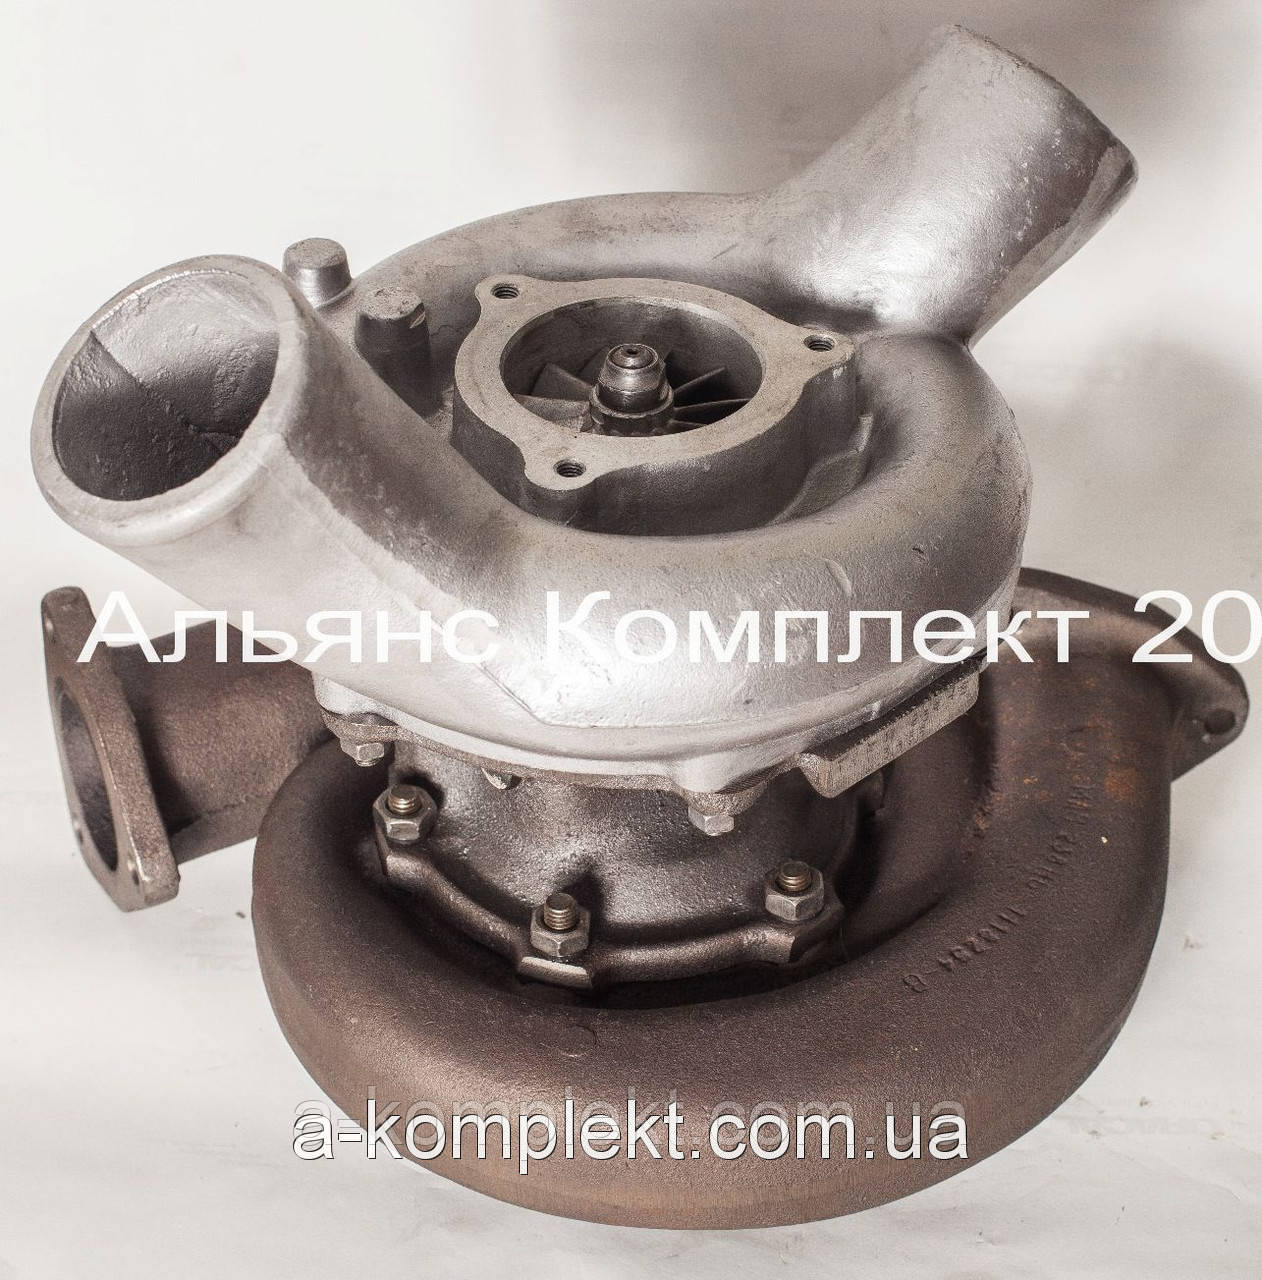 Турбокомпрессор ТКР 9-09 левый (120.000.000-09/ 12.1118010-09)